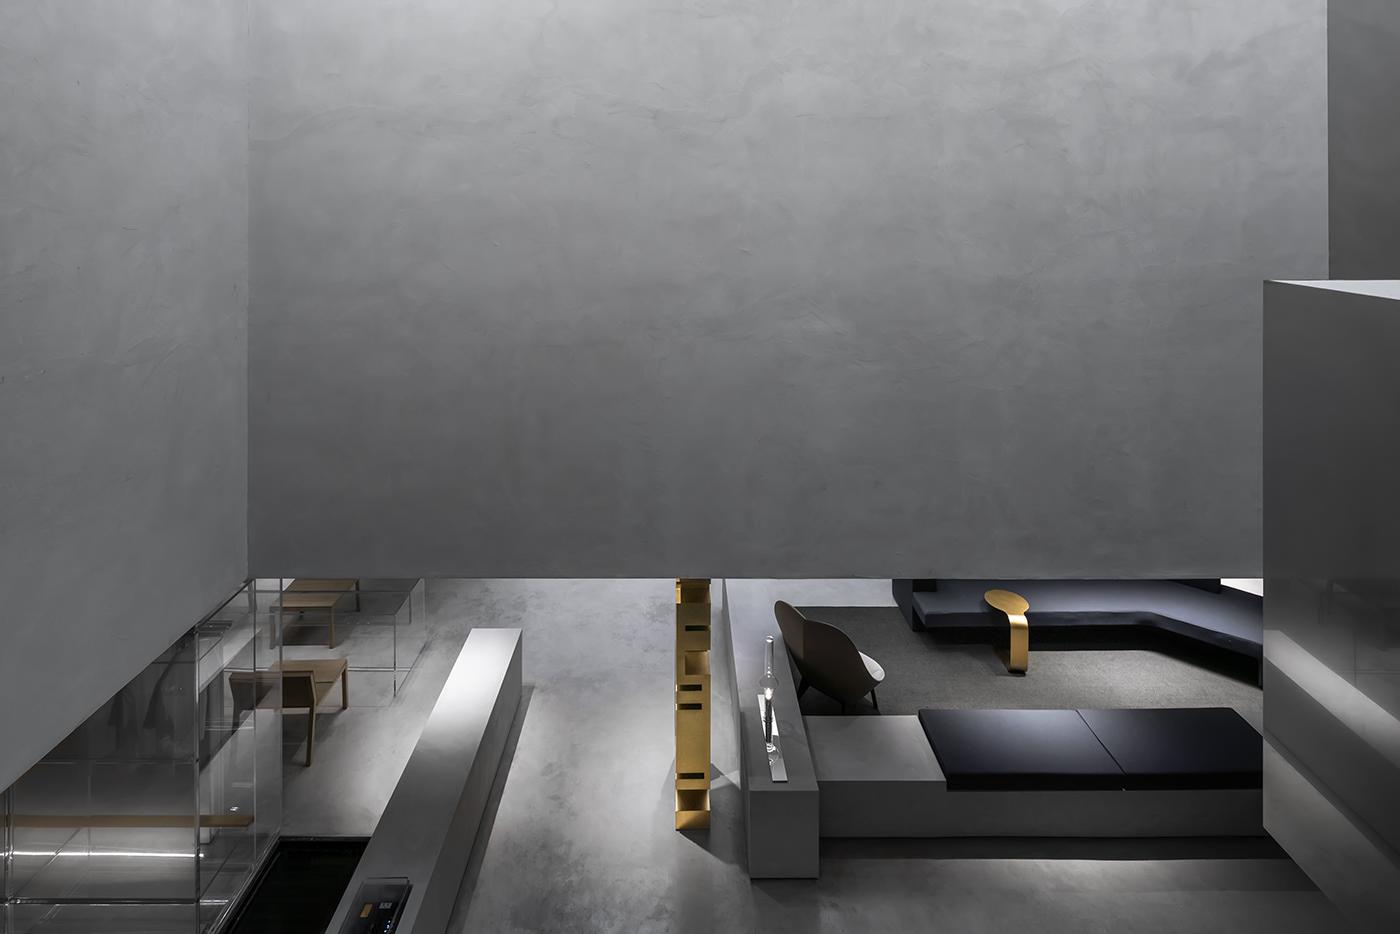 design Interior 室內設計 建築 攝影 設計